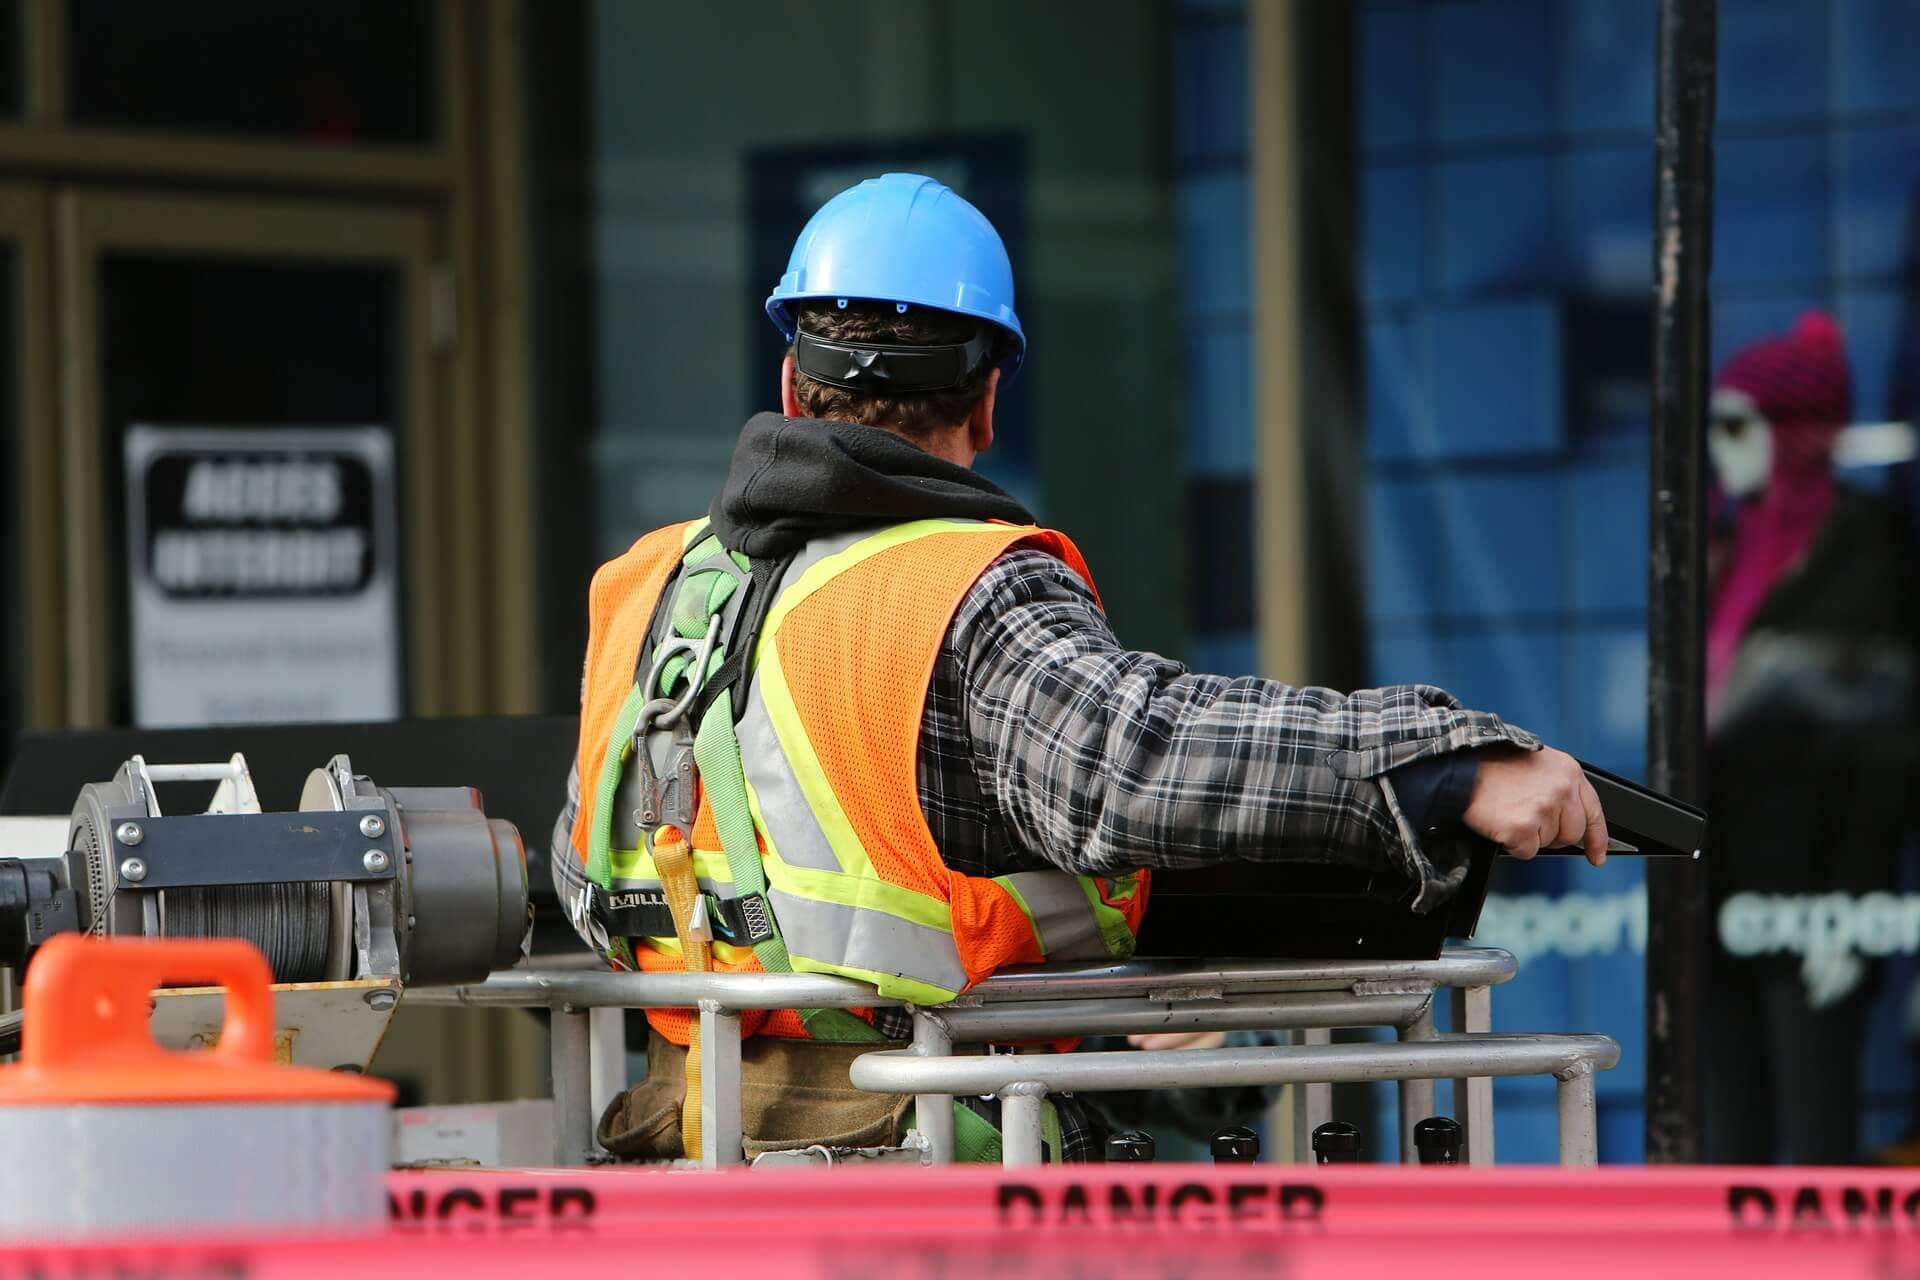 construction worker 569126 1920